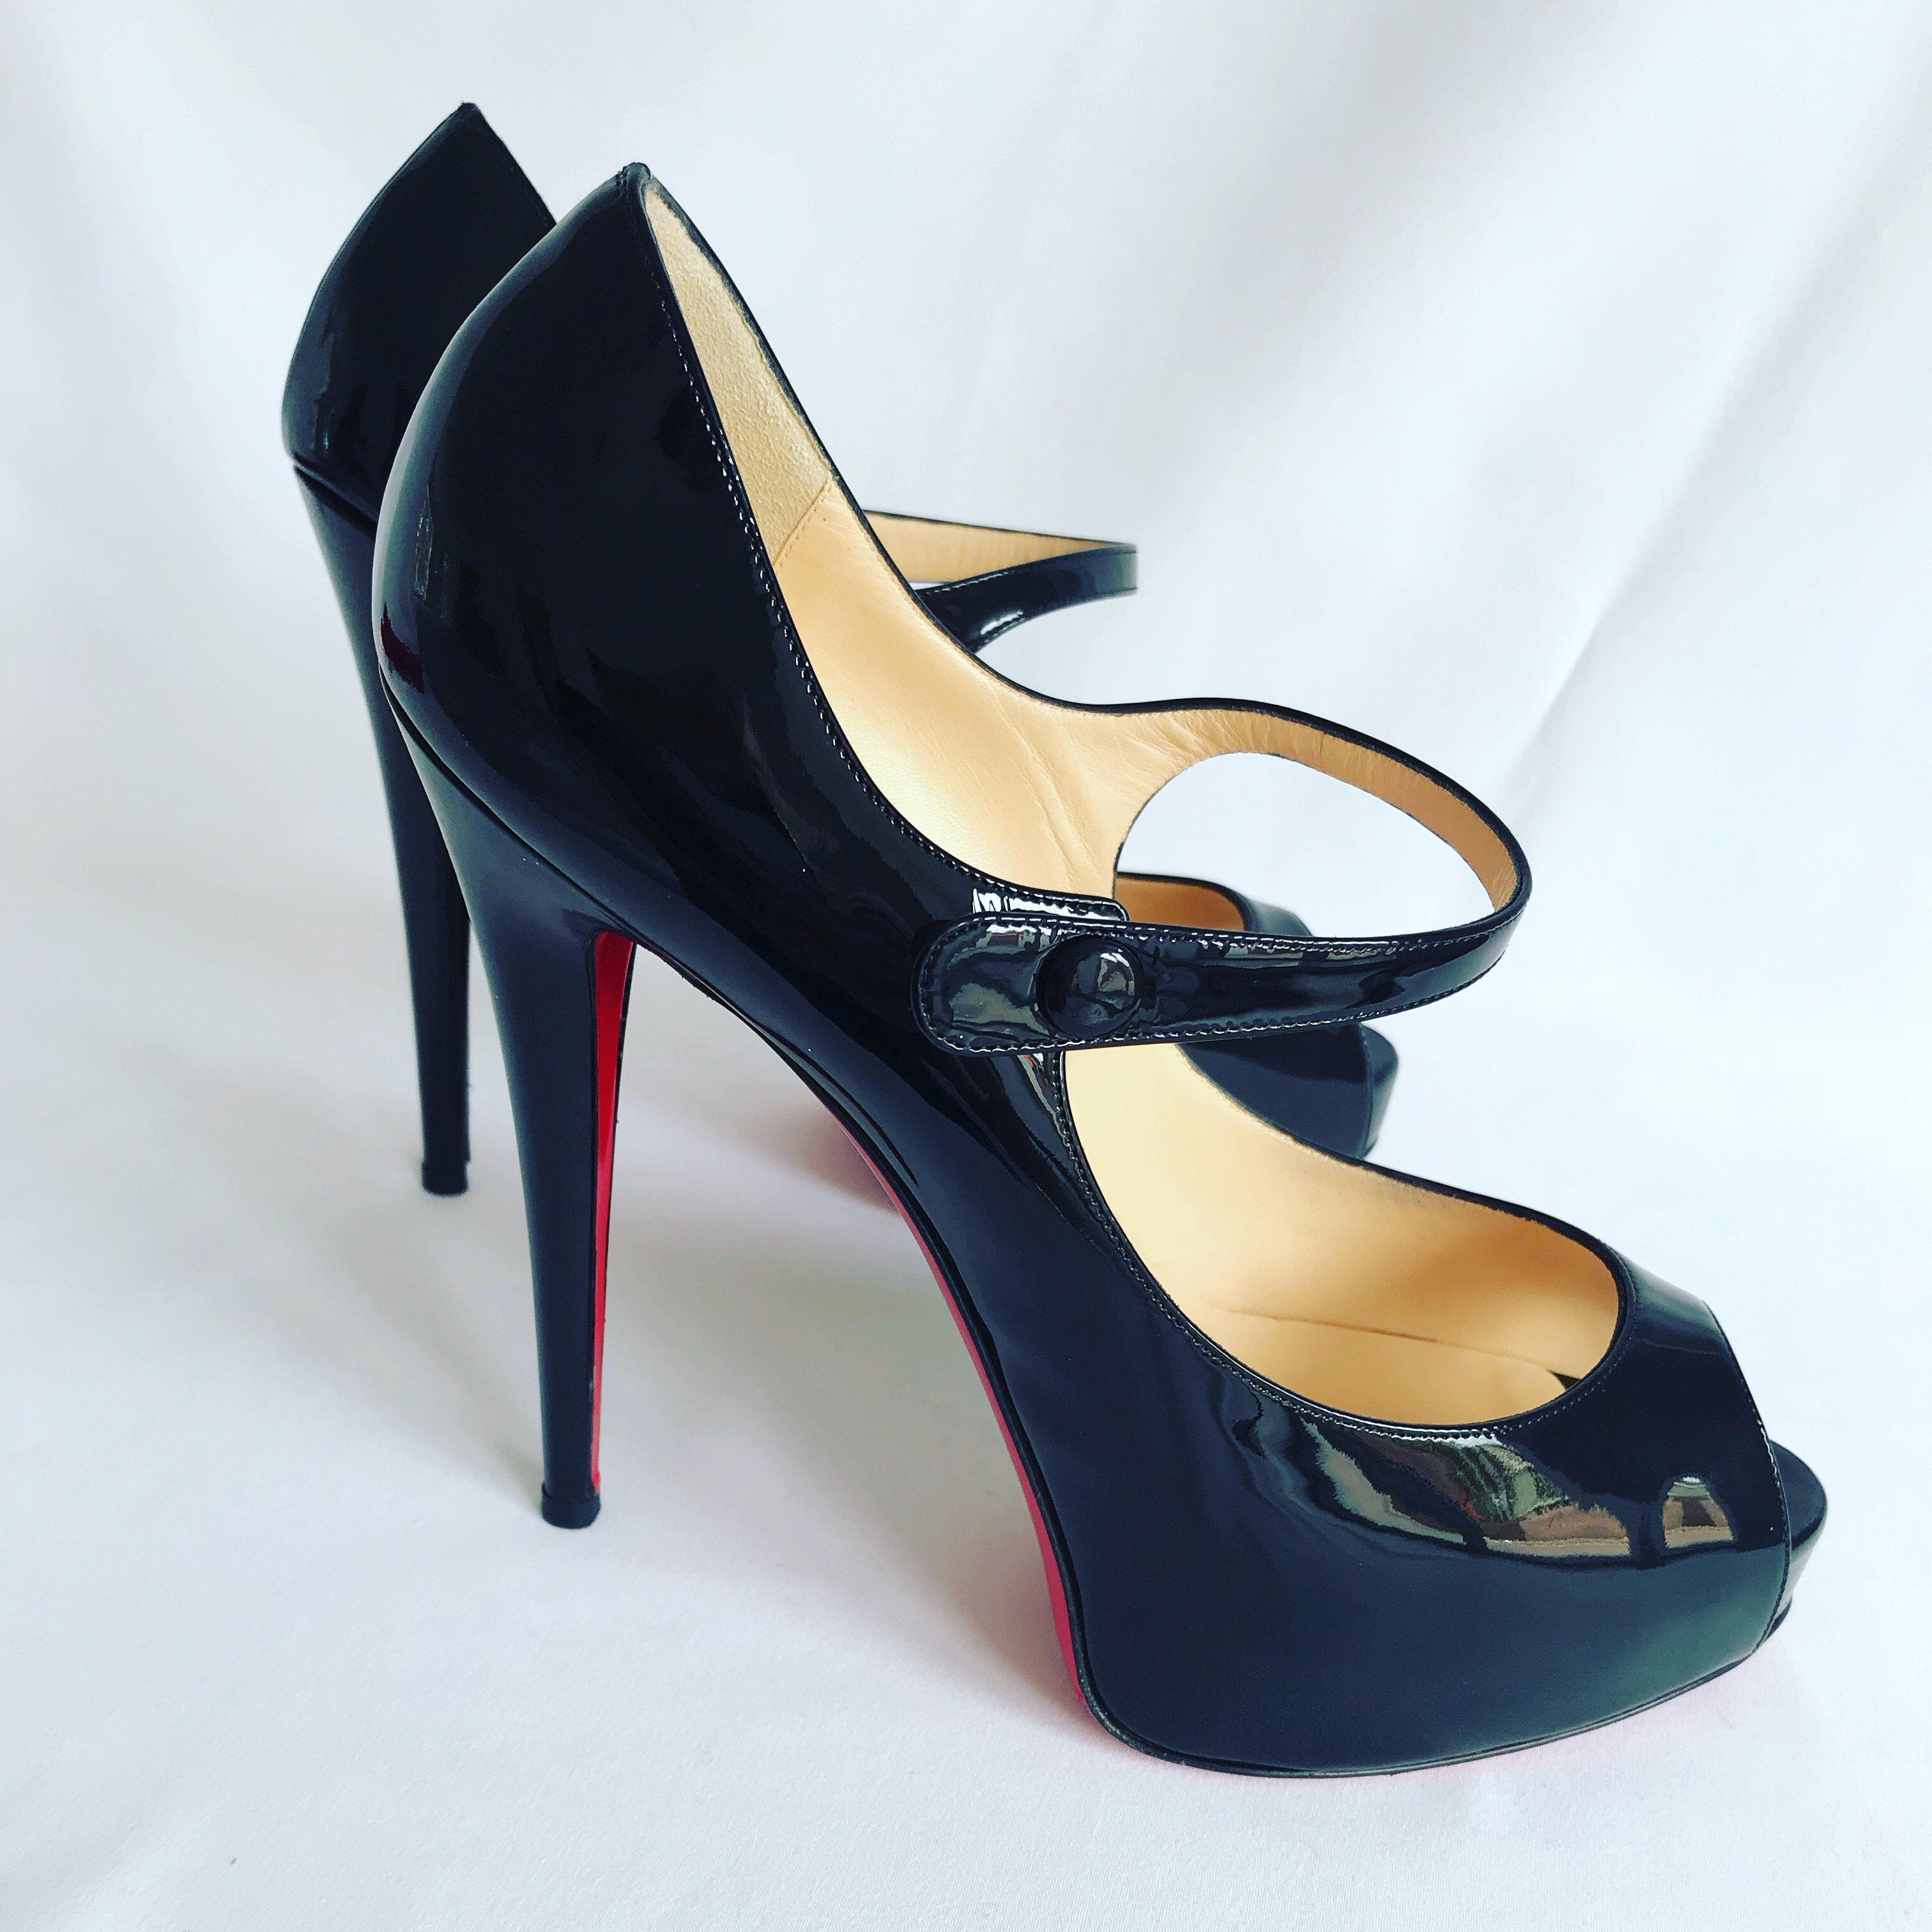 buy online 5b425 e39ed Christian Louboutin Black Patent Bana Mary Jane 130 Size 41.5 (UK 8.5) |  The ClassicCouture